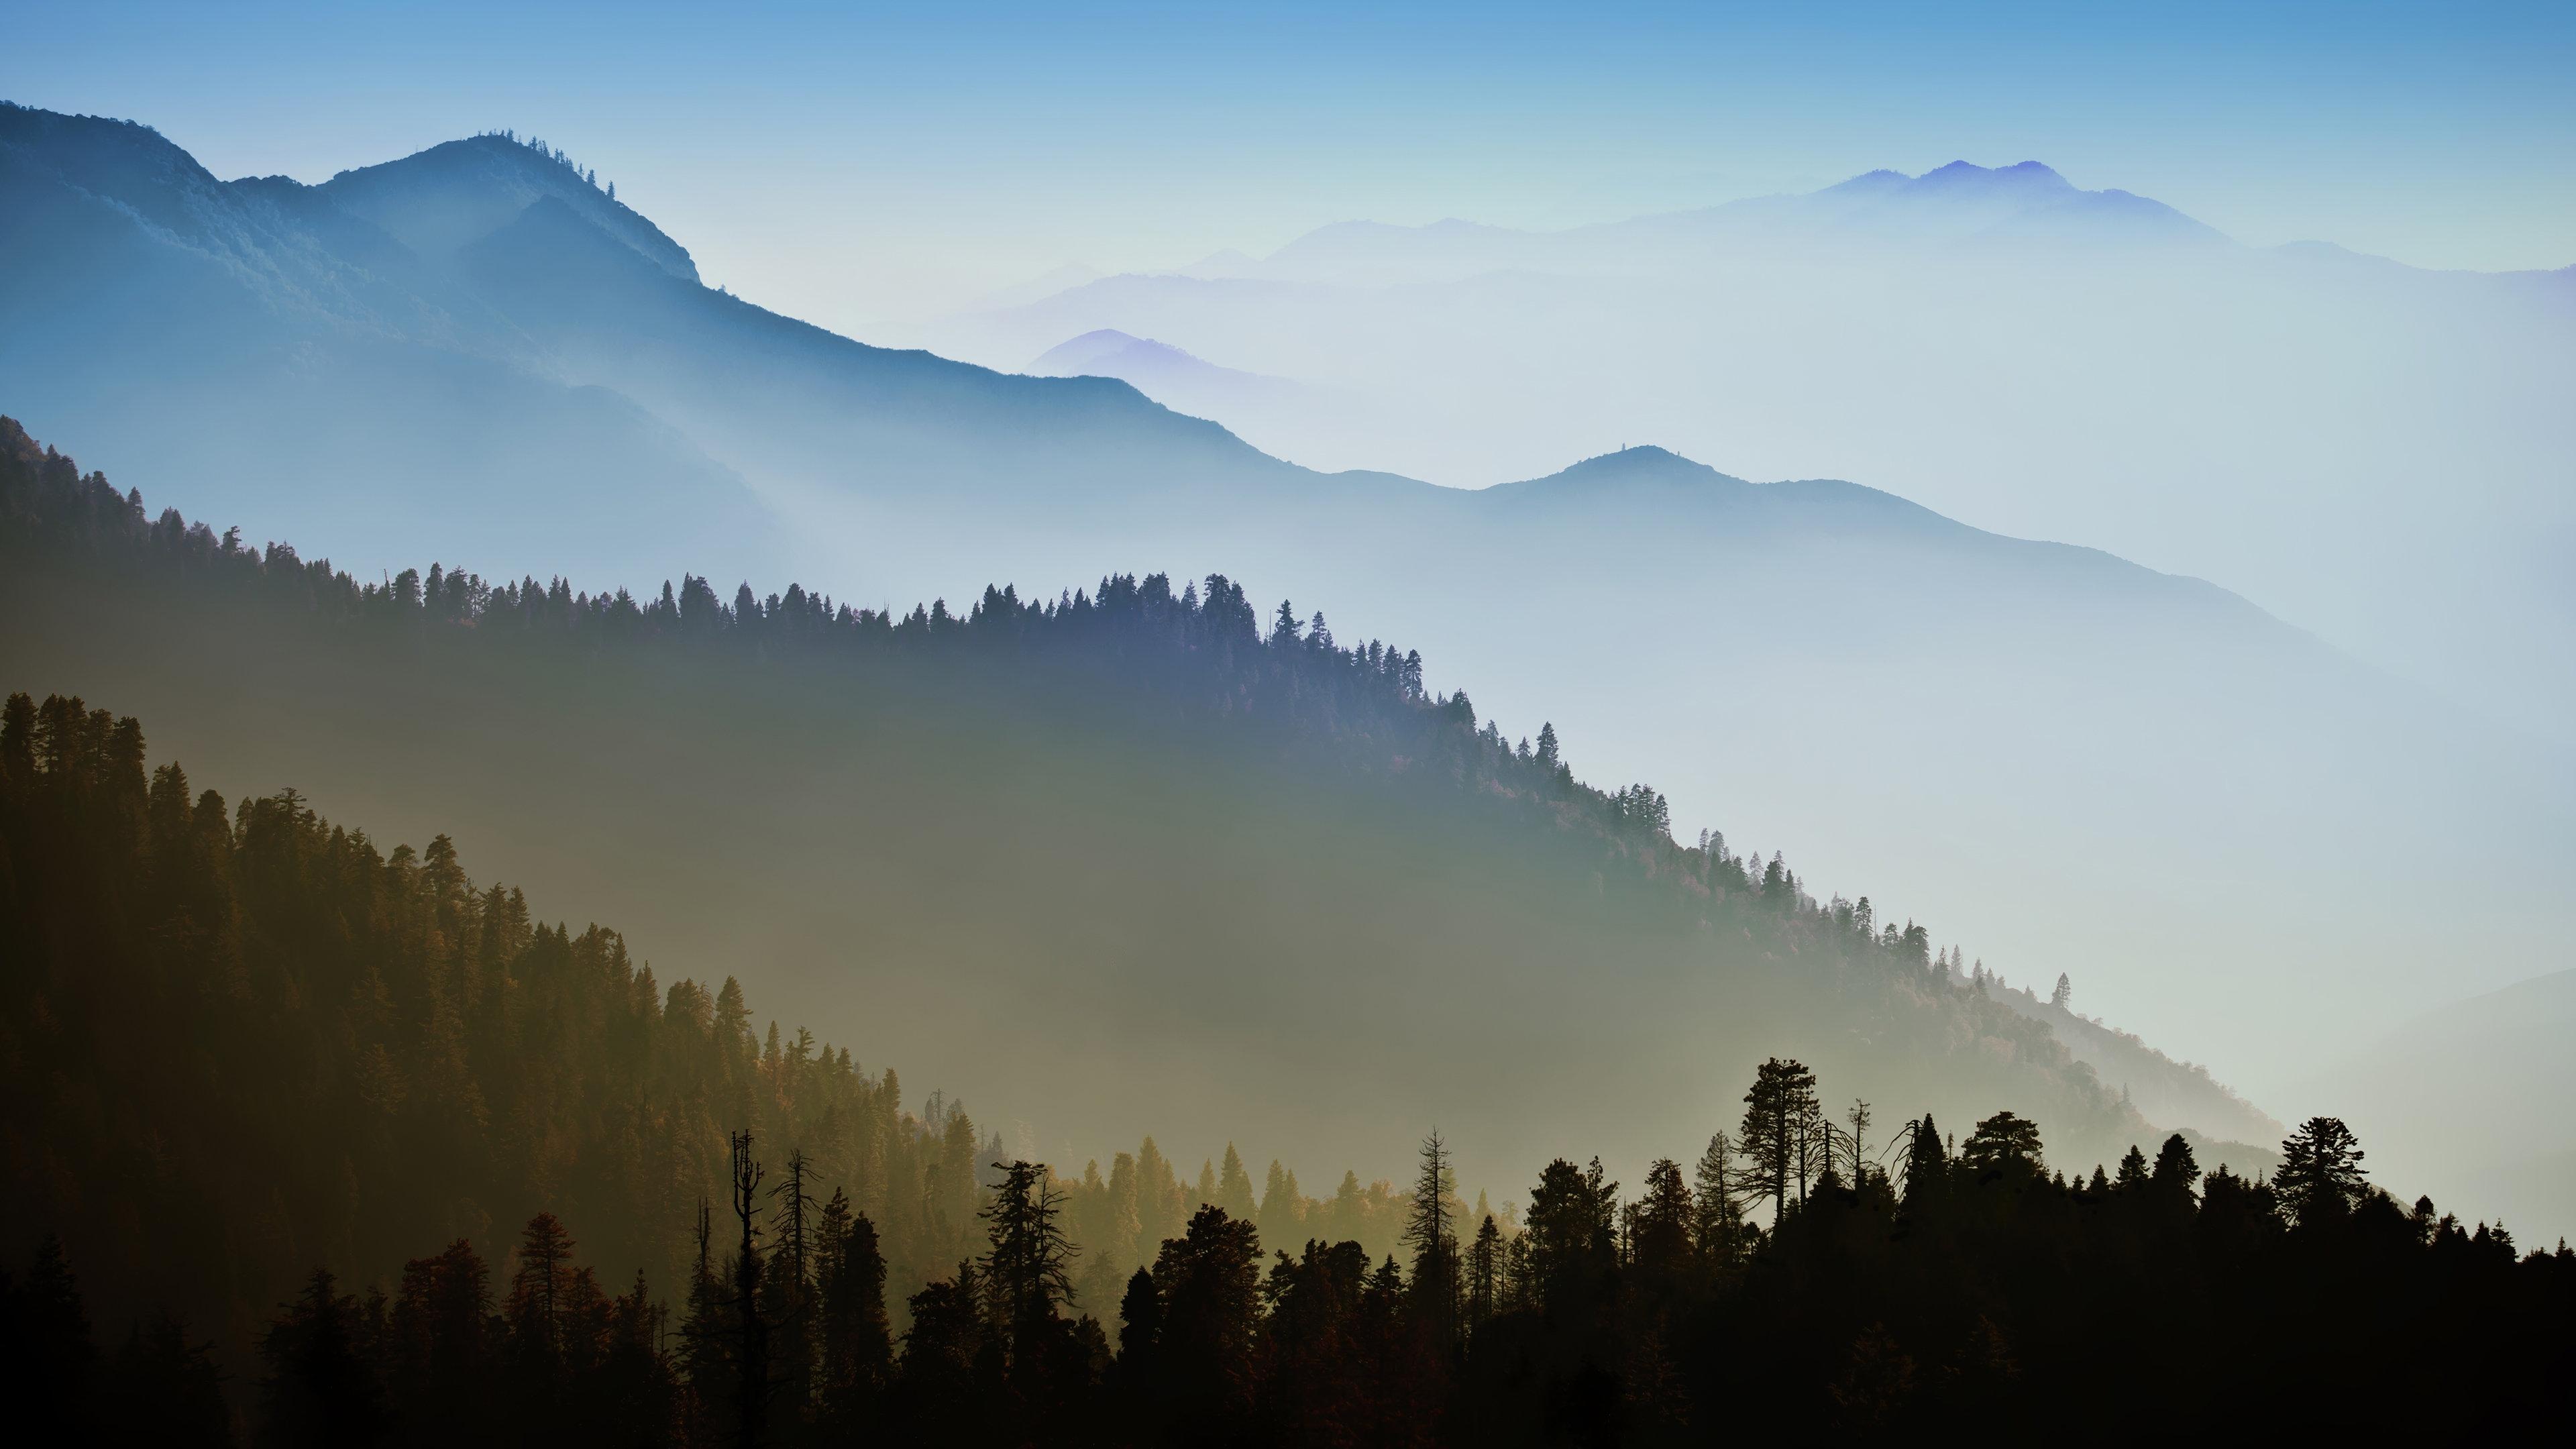 Nature Mountain Range Fog Sunrise 4k Ultra Hd Wallpaper 3840x2160